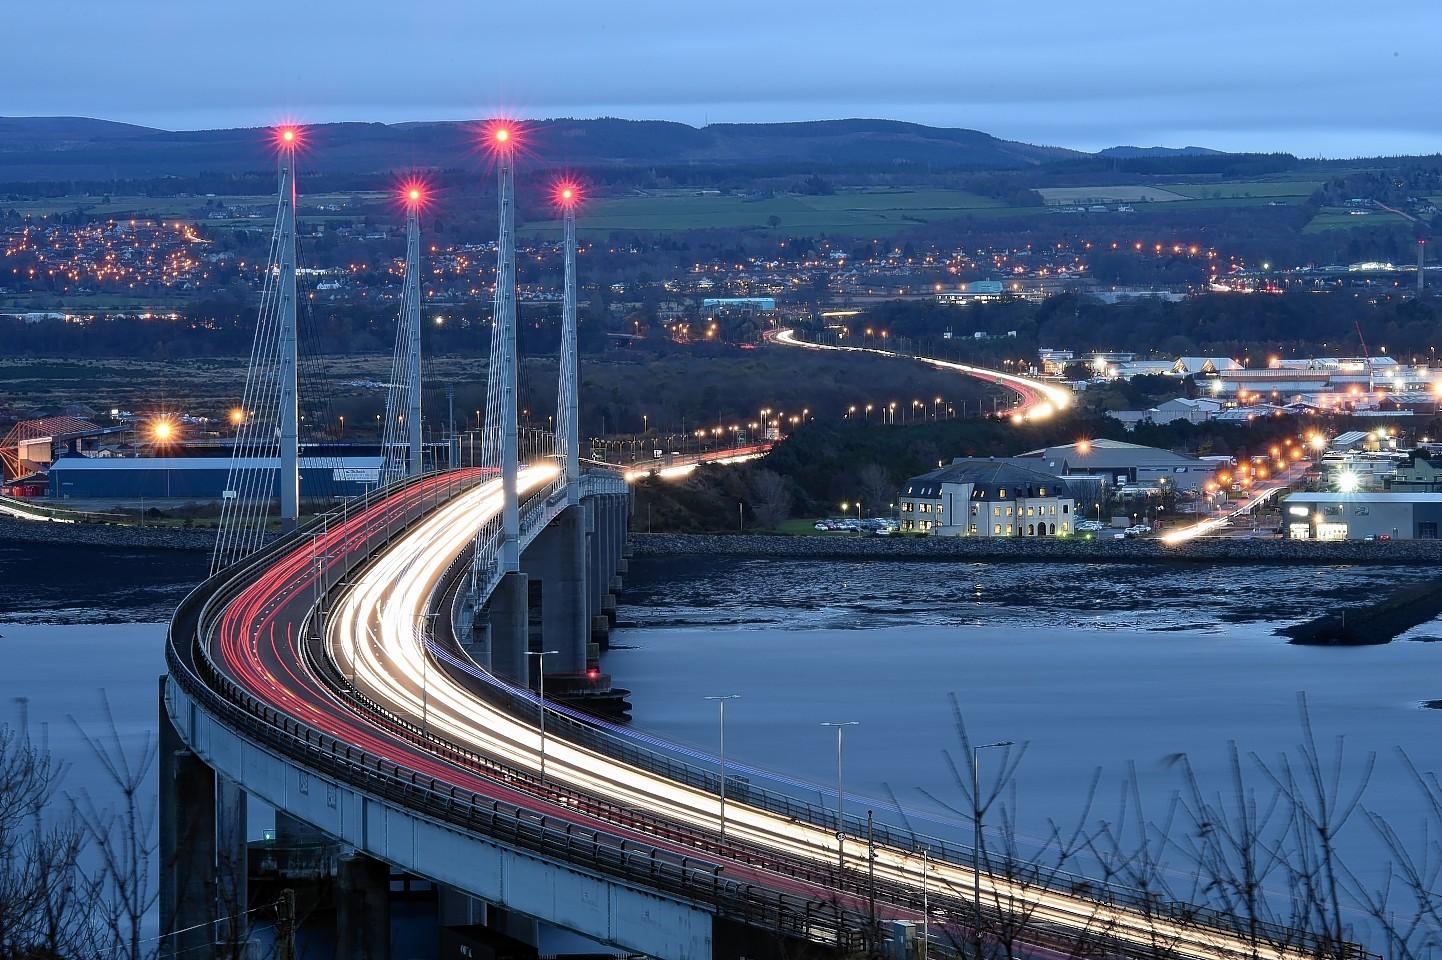 Traffic on the Kessock Bridge in Inverness.